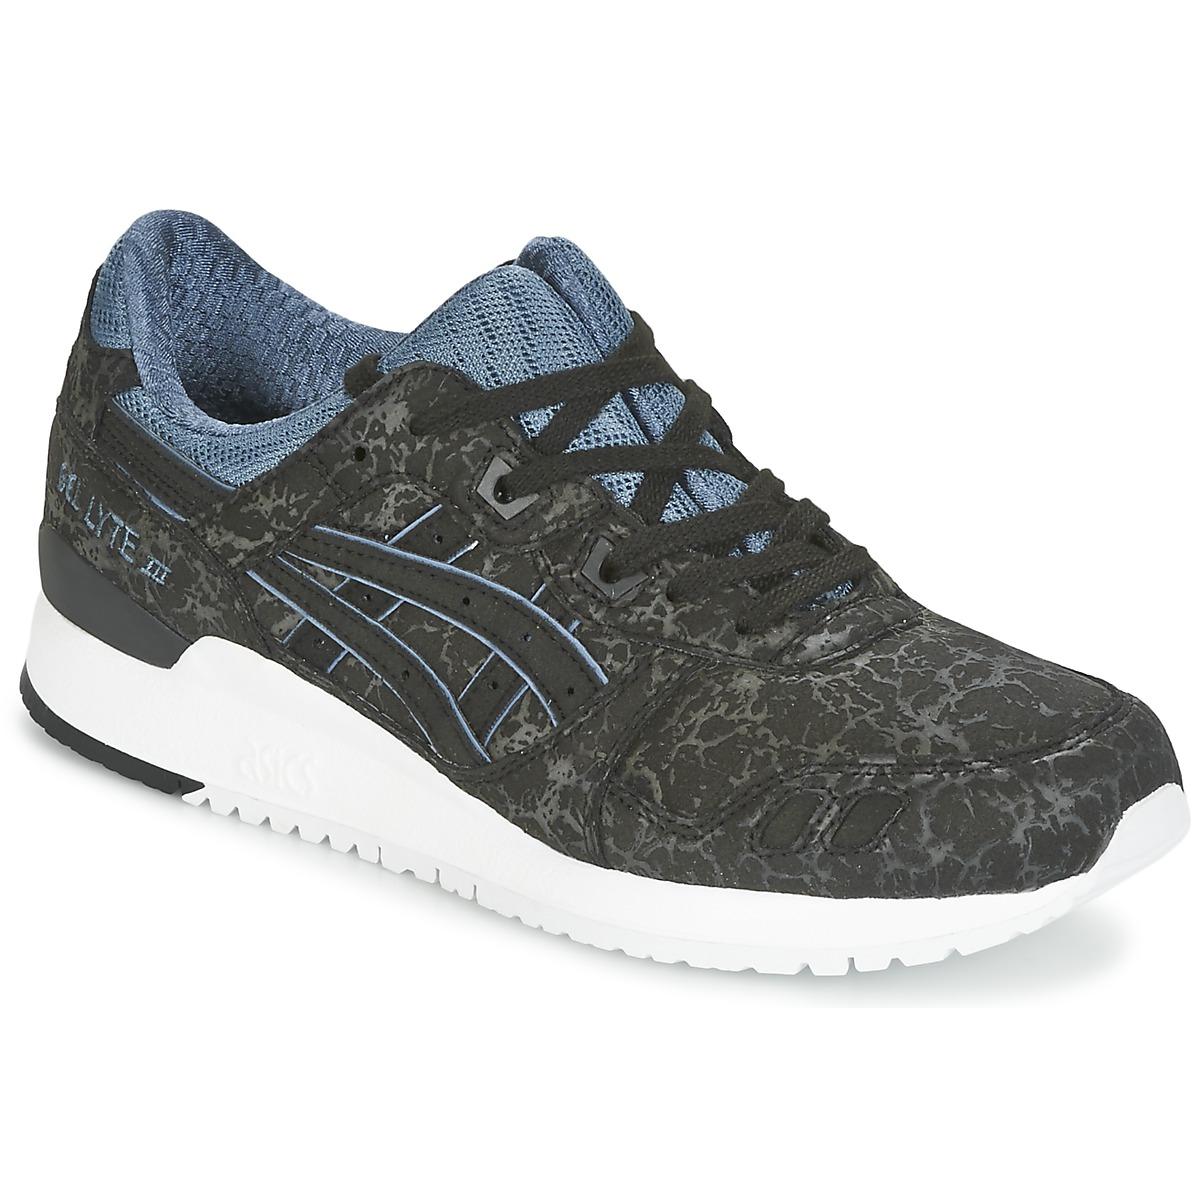 Asics GEL-LYTE III Schwarz / Blau - Kostenloser Versand bei Spartoode ! - Schuhe Sneaker Low  75,00 €